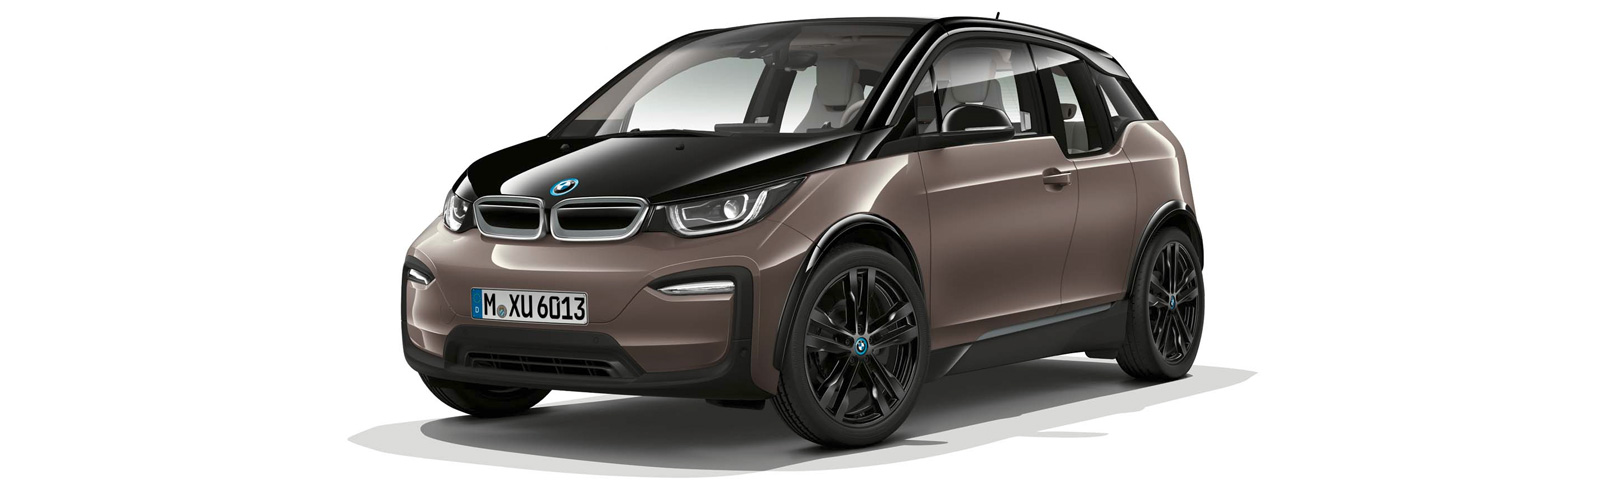 BMW recalls 2019 BMW i3 and i8 models